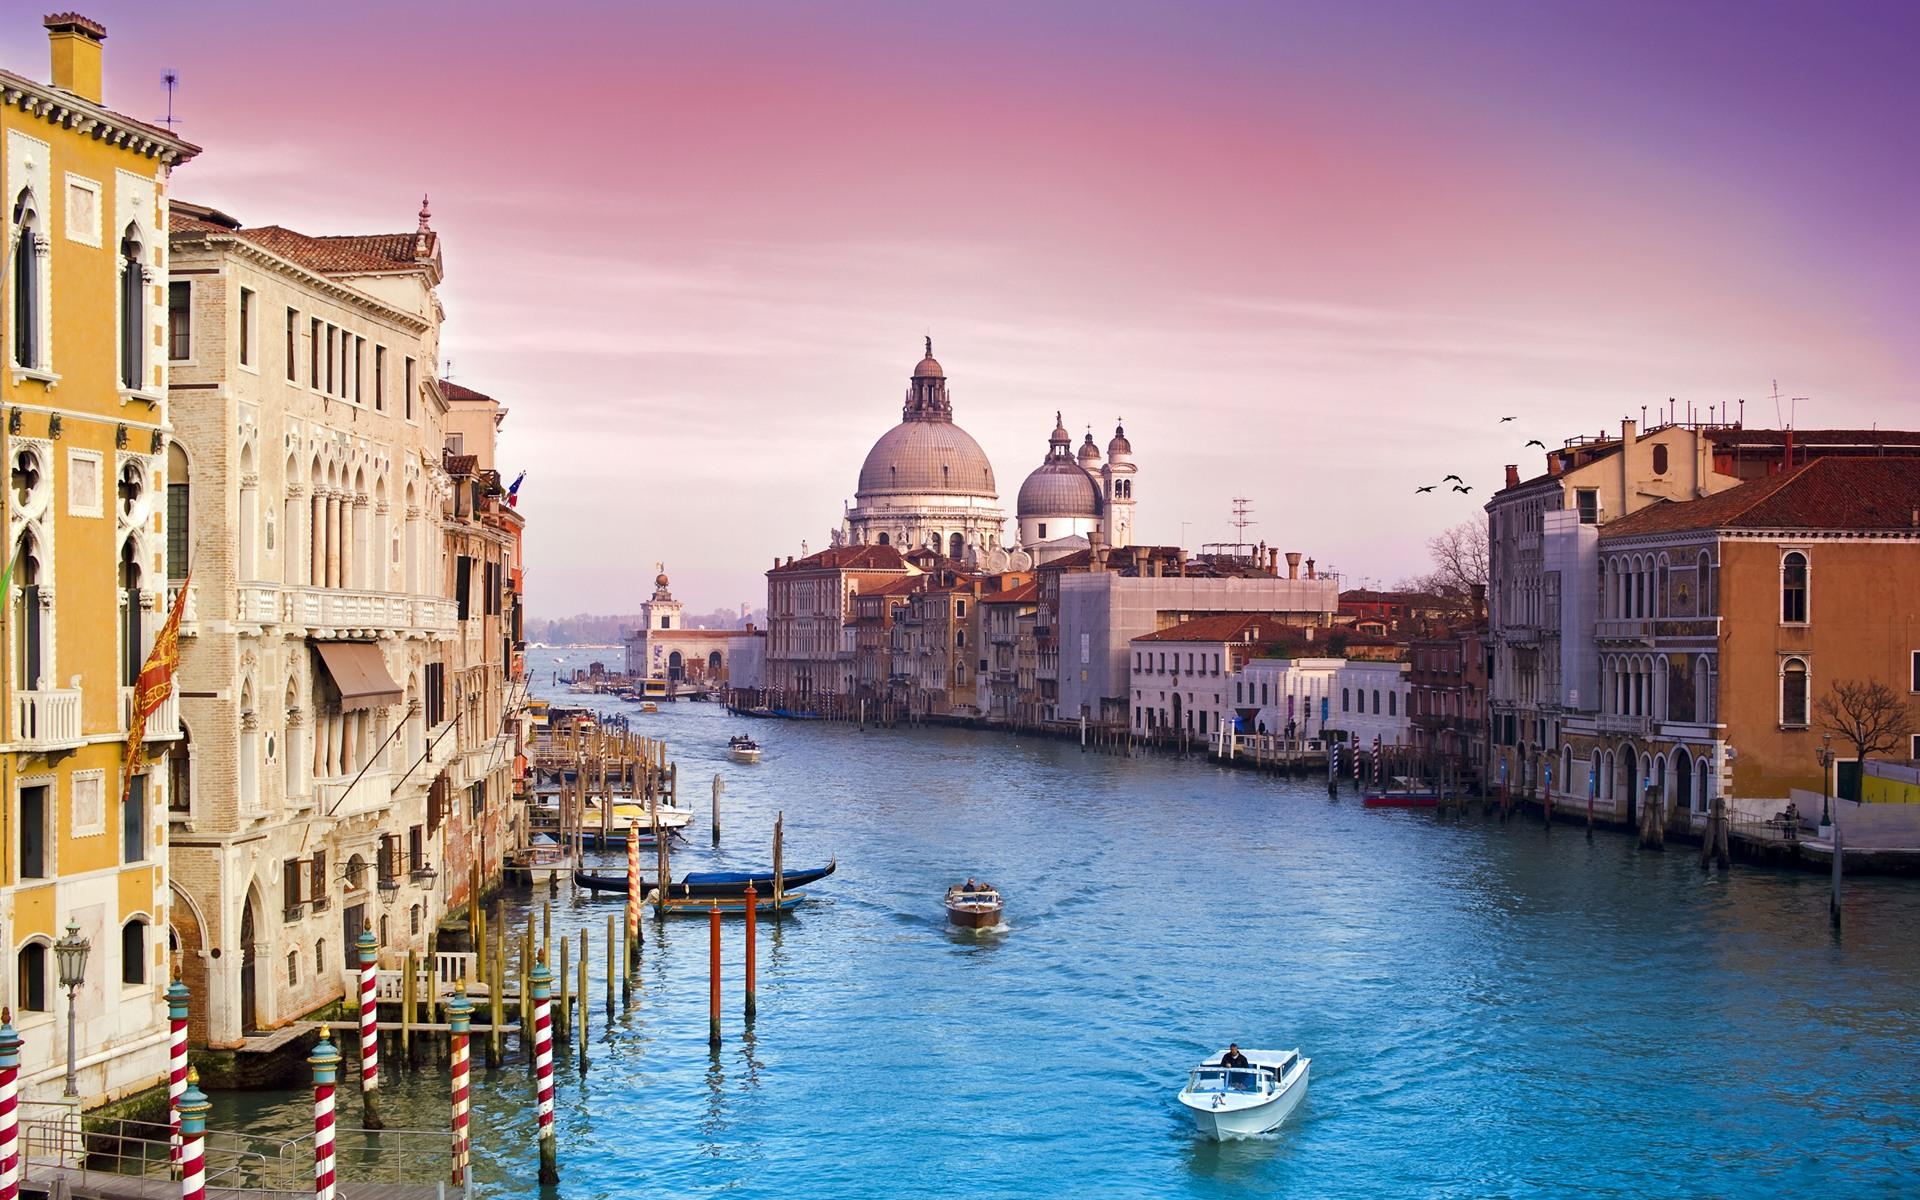 Italy desktop wallpaper 1920x1200